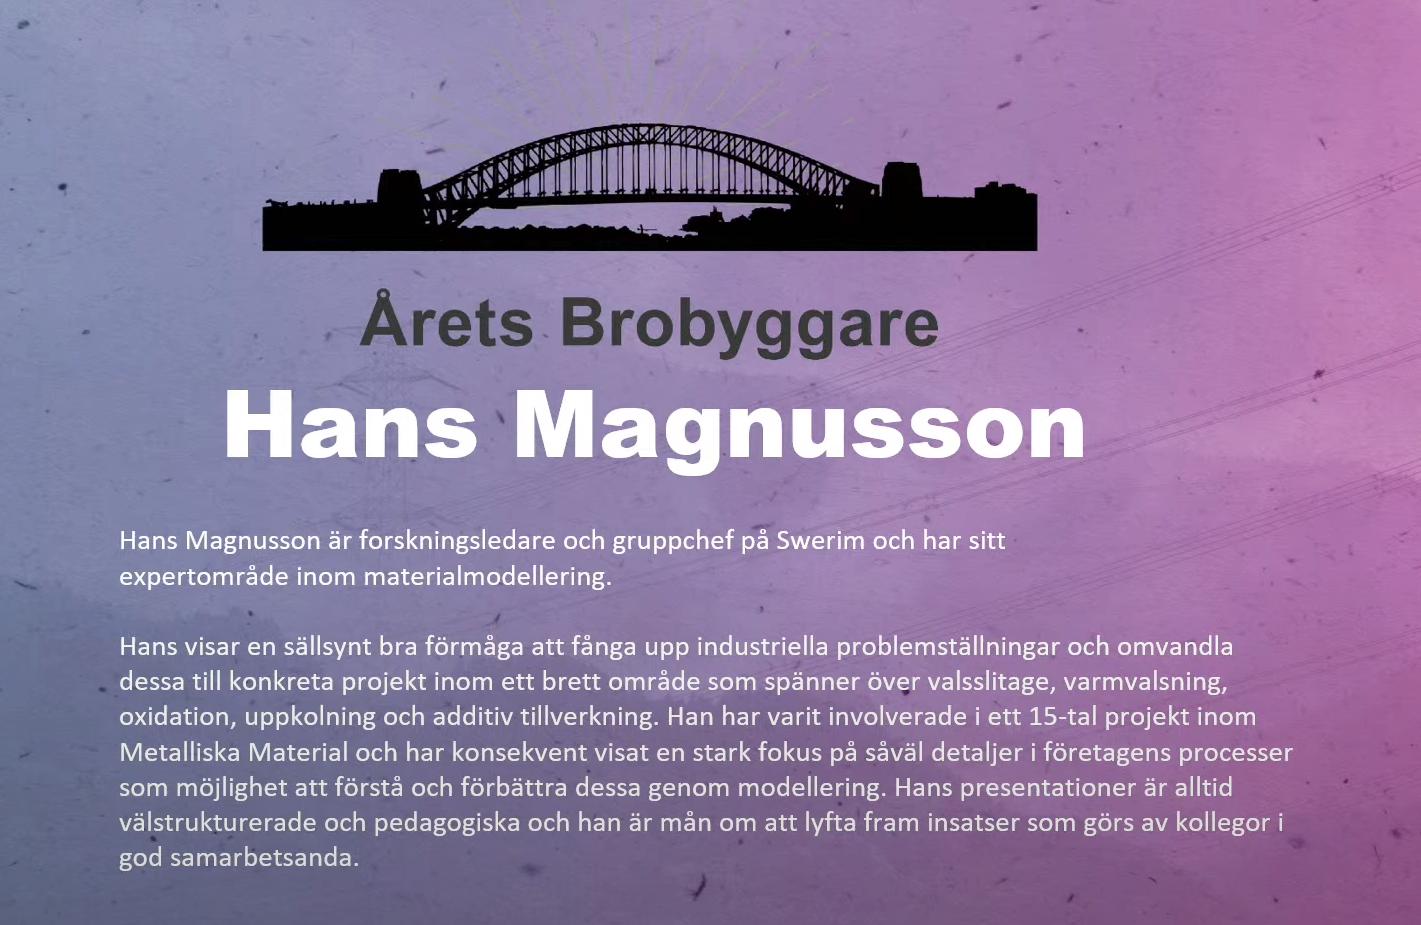 Årets brobyggare, Hans Magnusson